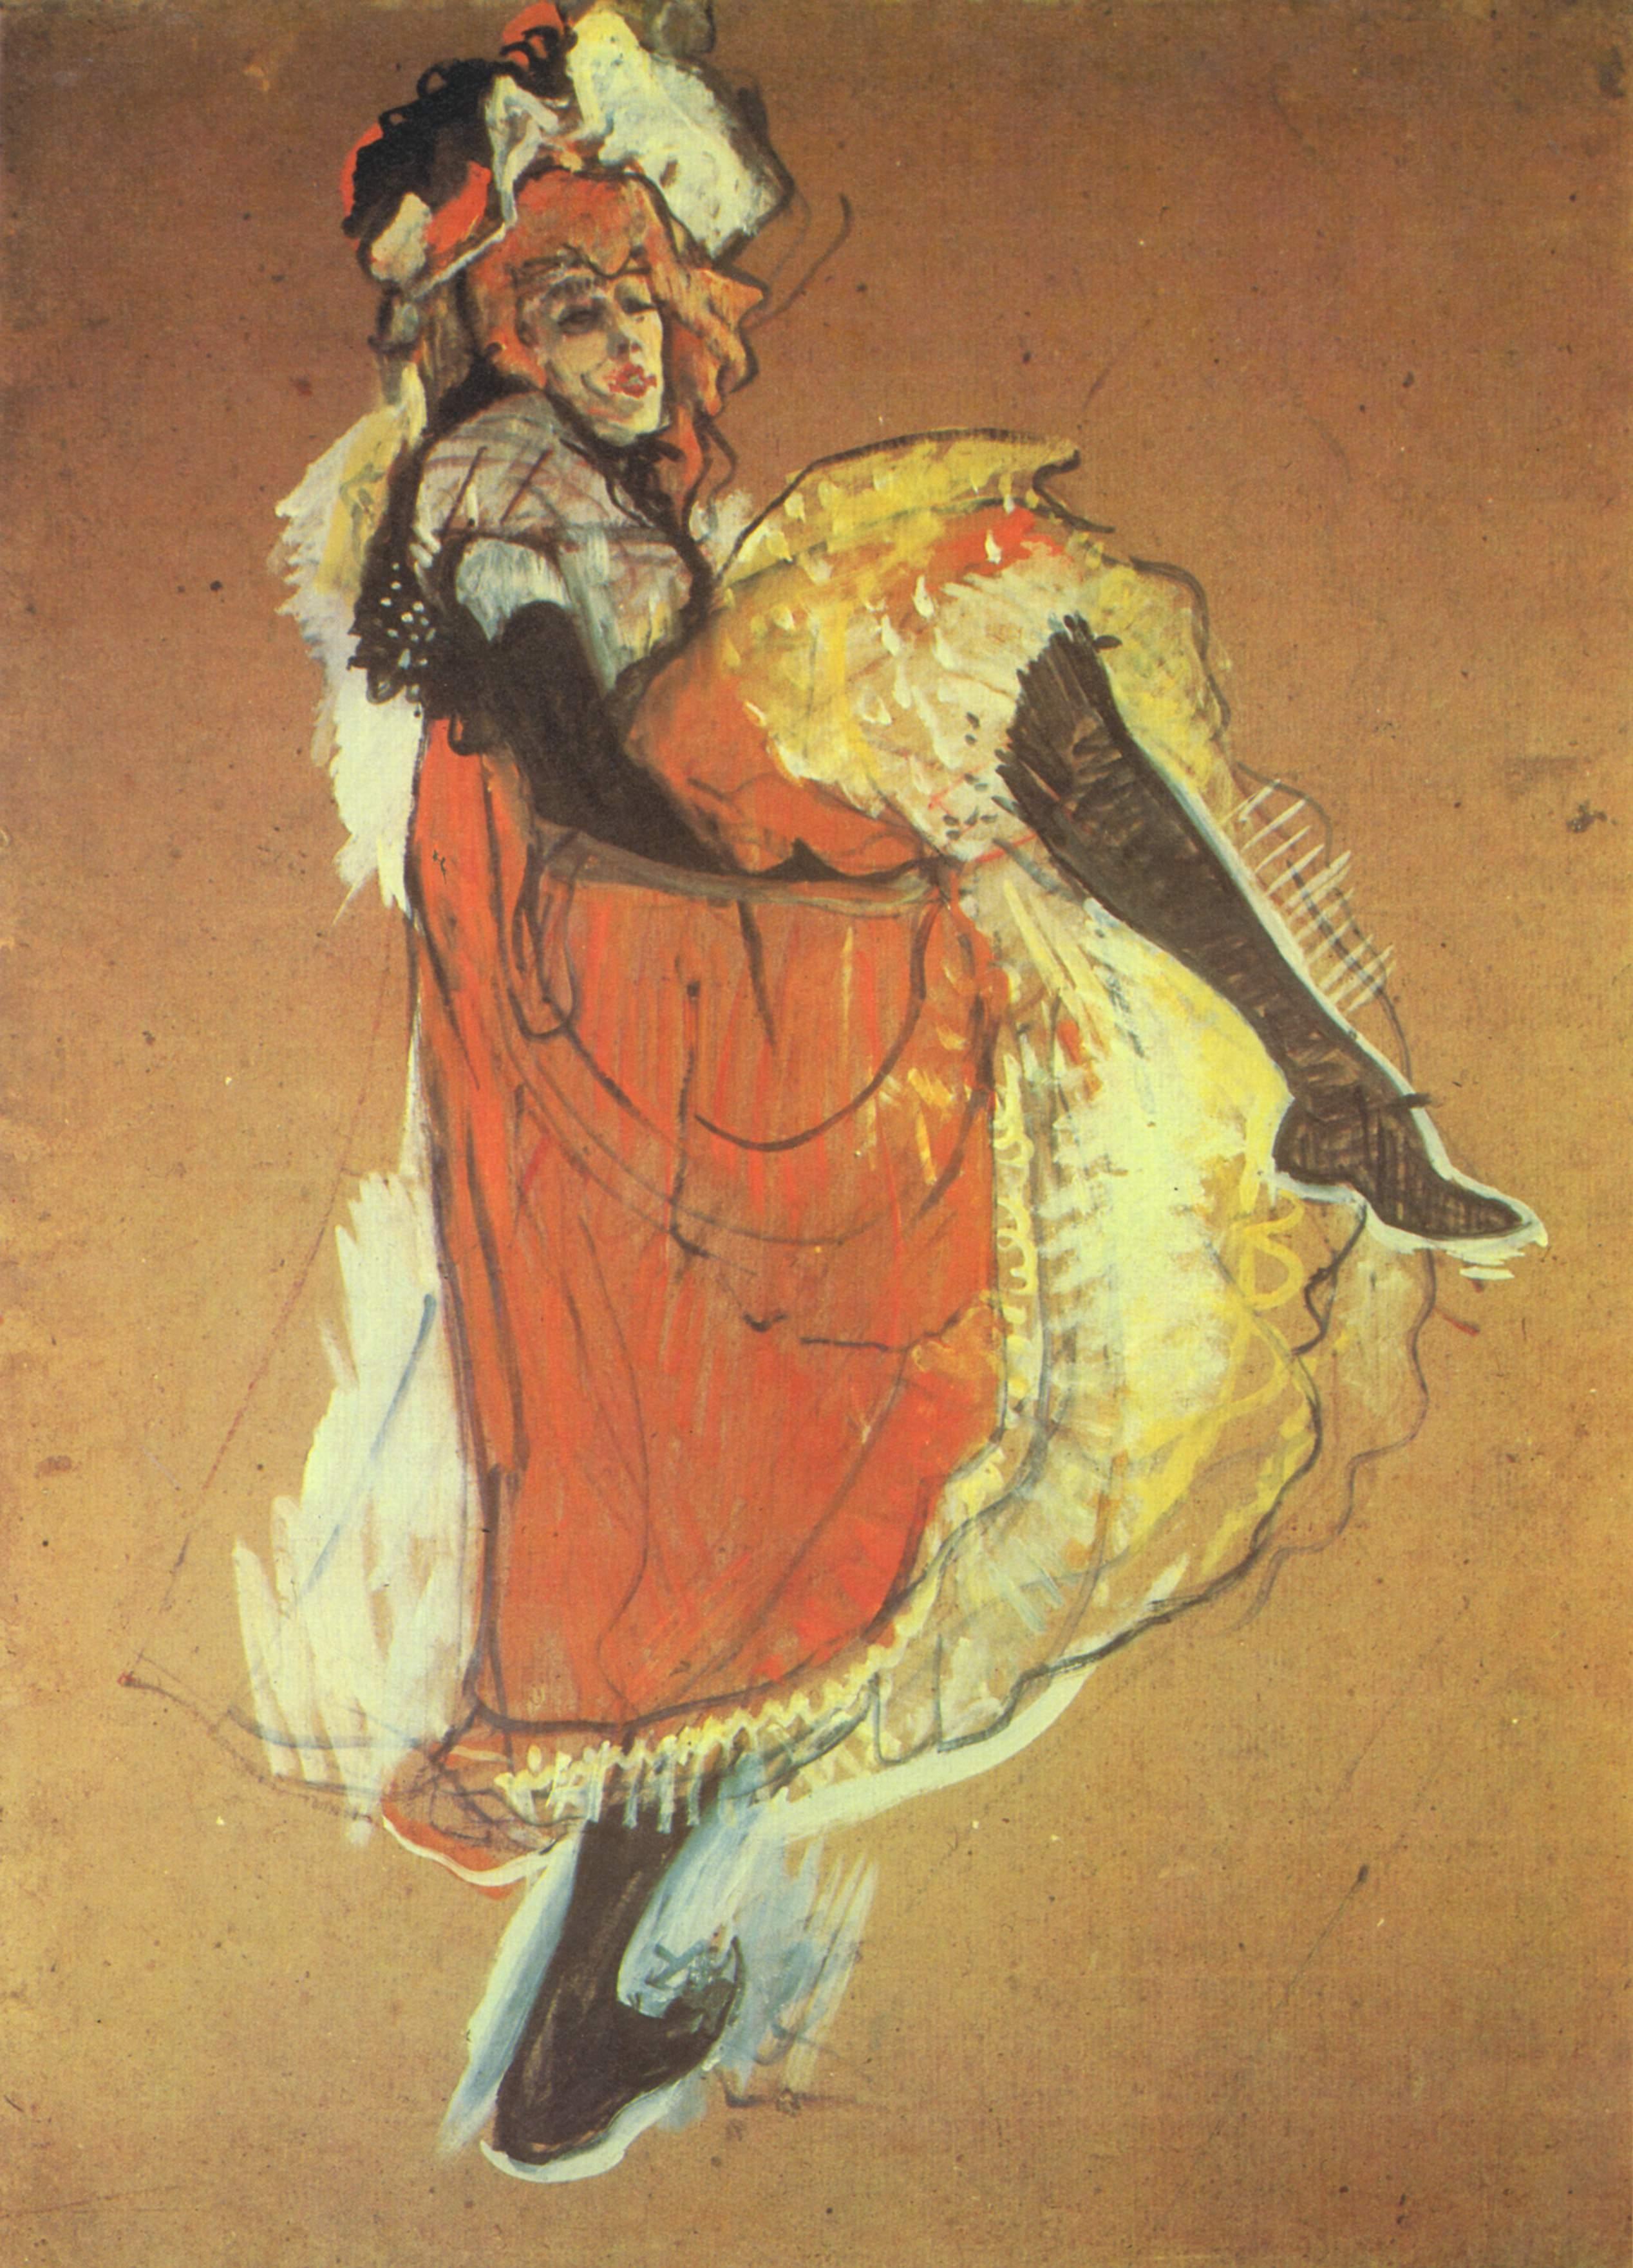 Lot 24 - OSKAR KOKOSCHKA (1886-1990) Frau mit schwarzen Strümpfen 26 3/4 x 19 5/8 in (67.9 x 49.8 cm)